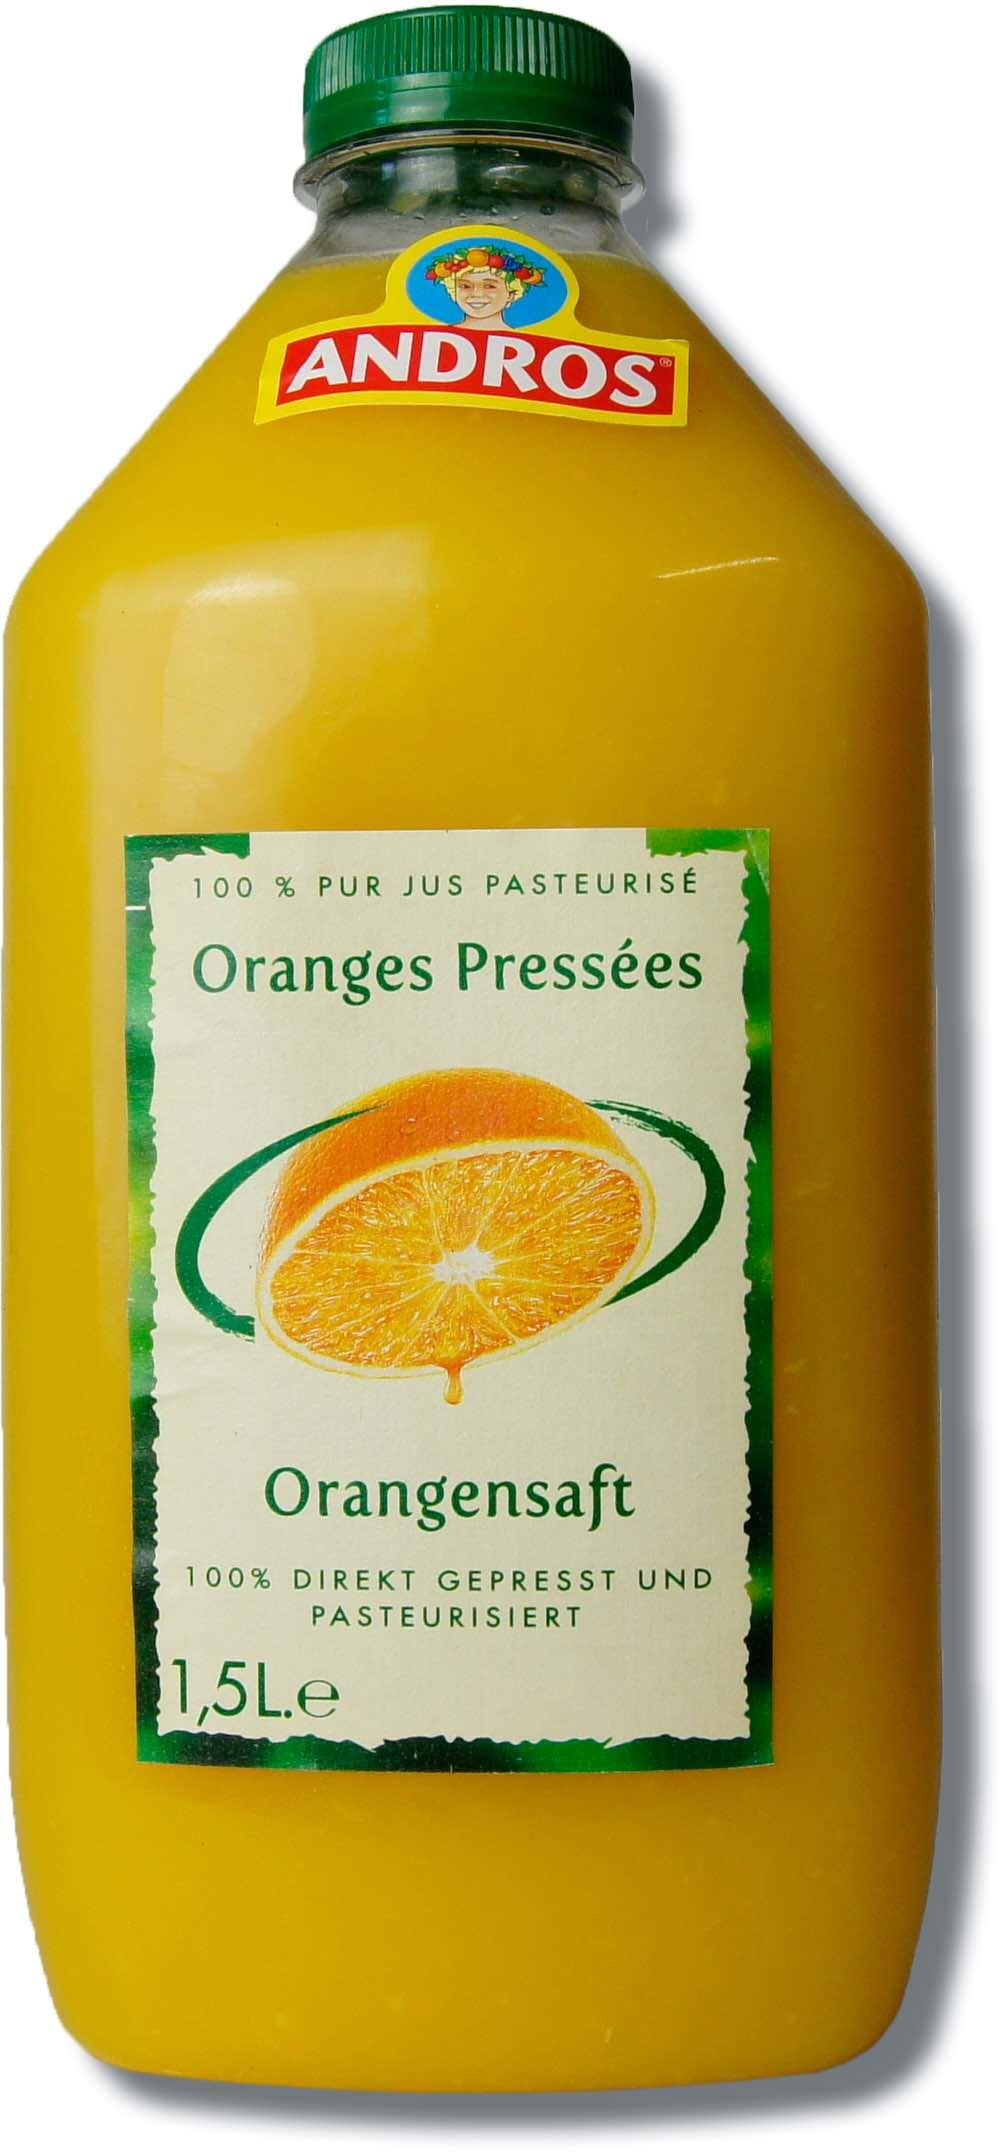 Andros Orangensaft, 1,5lt